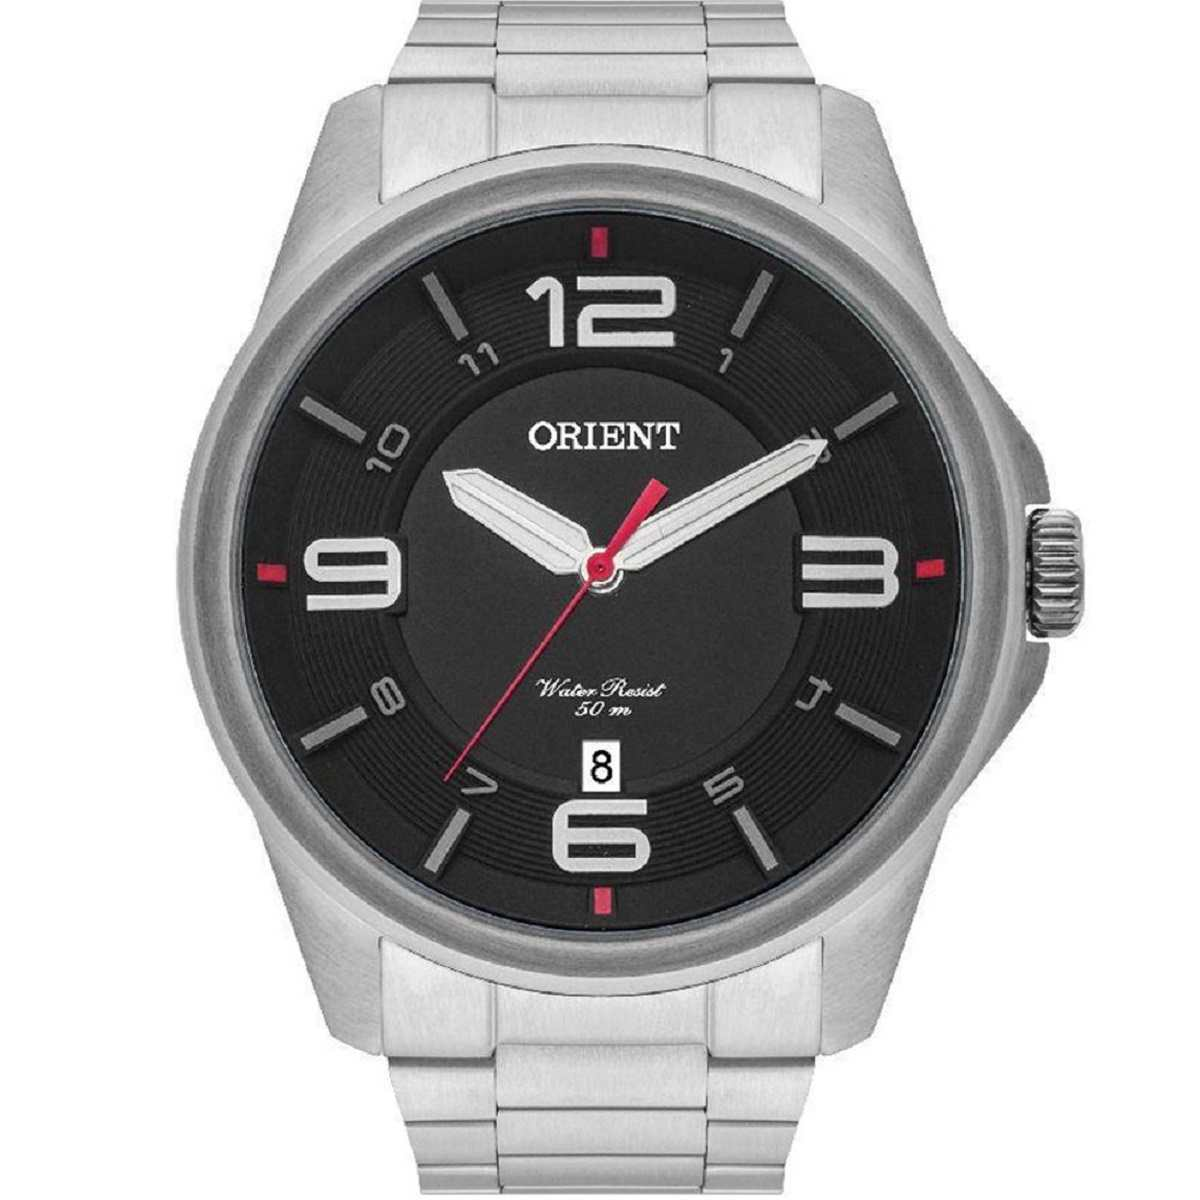 Relógio Orient Masculino Prateado MBSS1288 P2SX